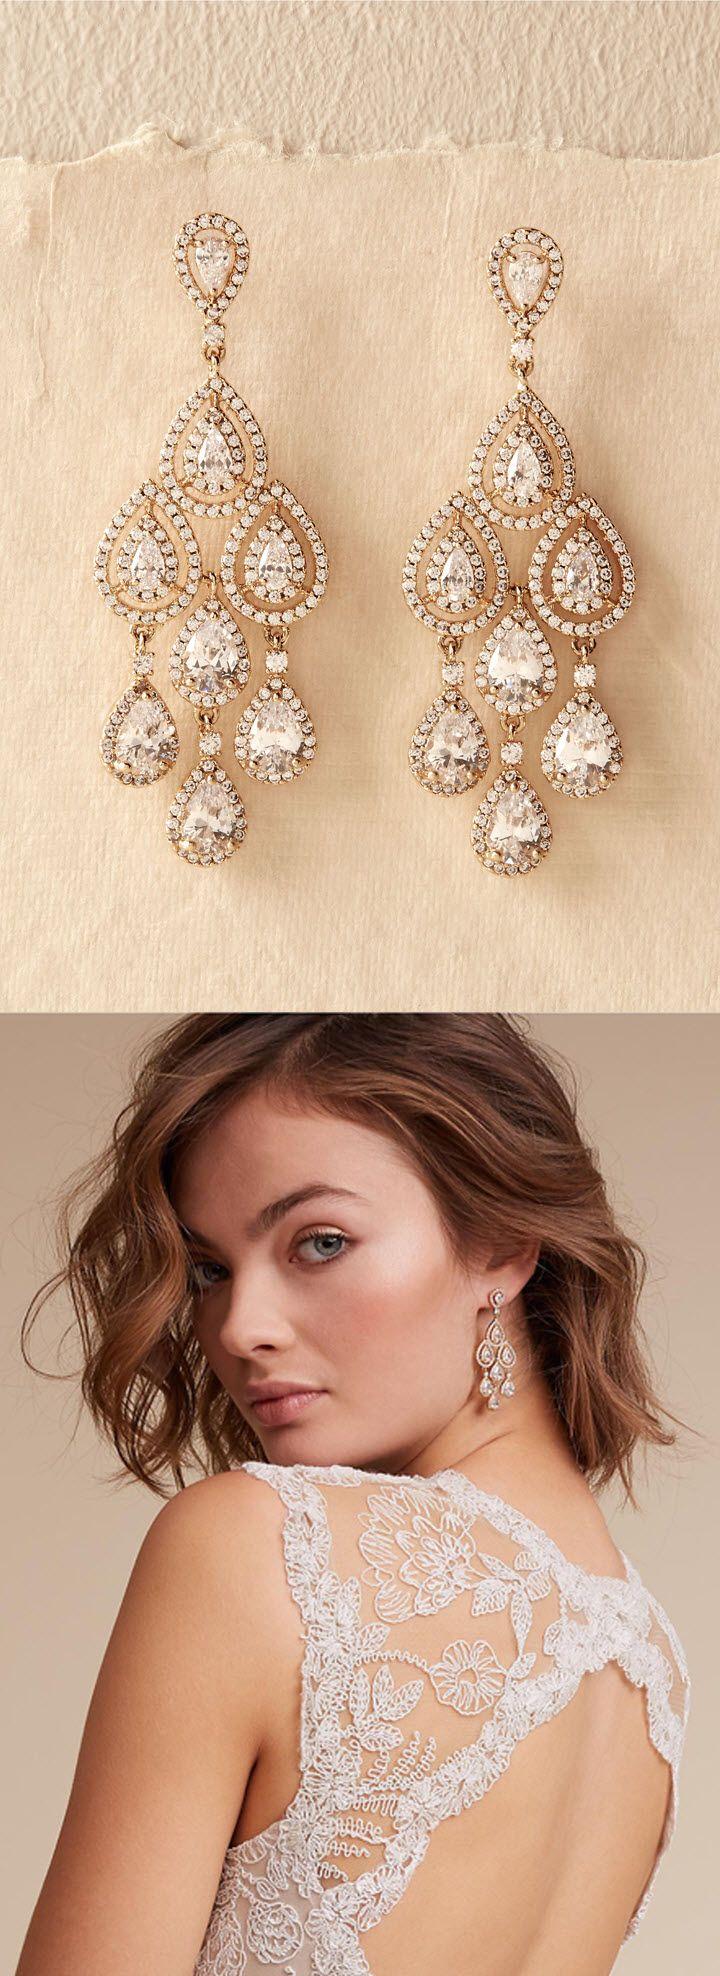 Gold chandelier earrings for wedding or special occasion gilded gold chandelier earrings for wedding or special occasion arubaitofo Gallery